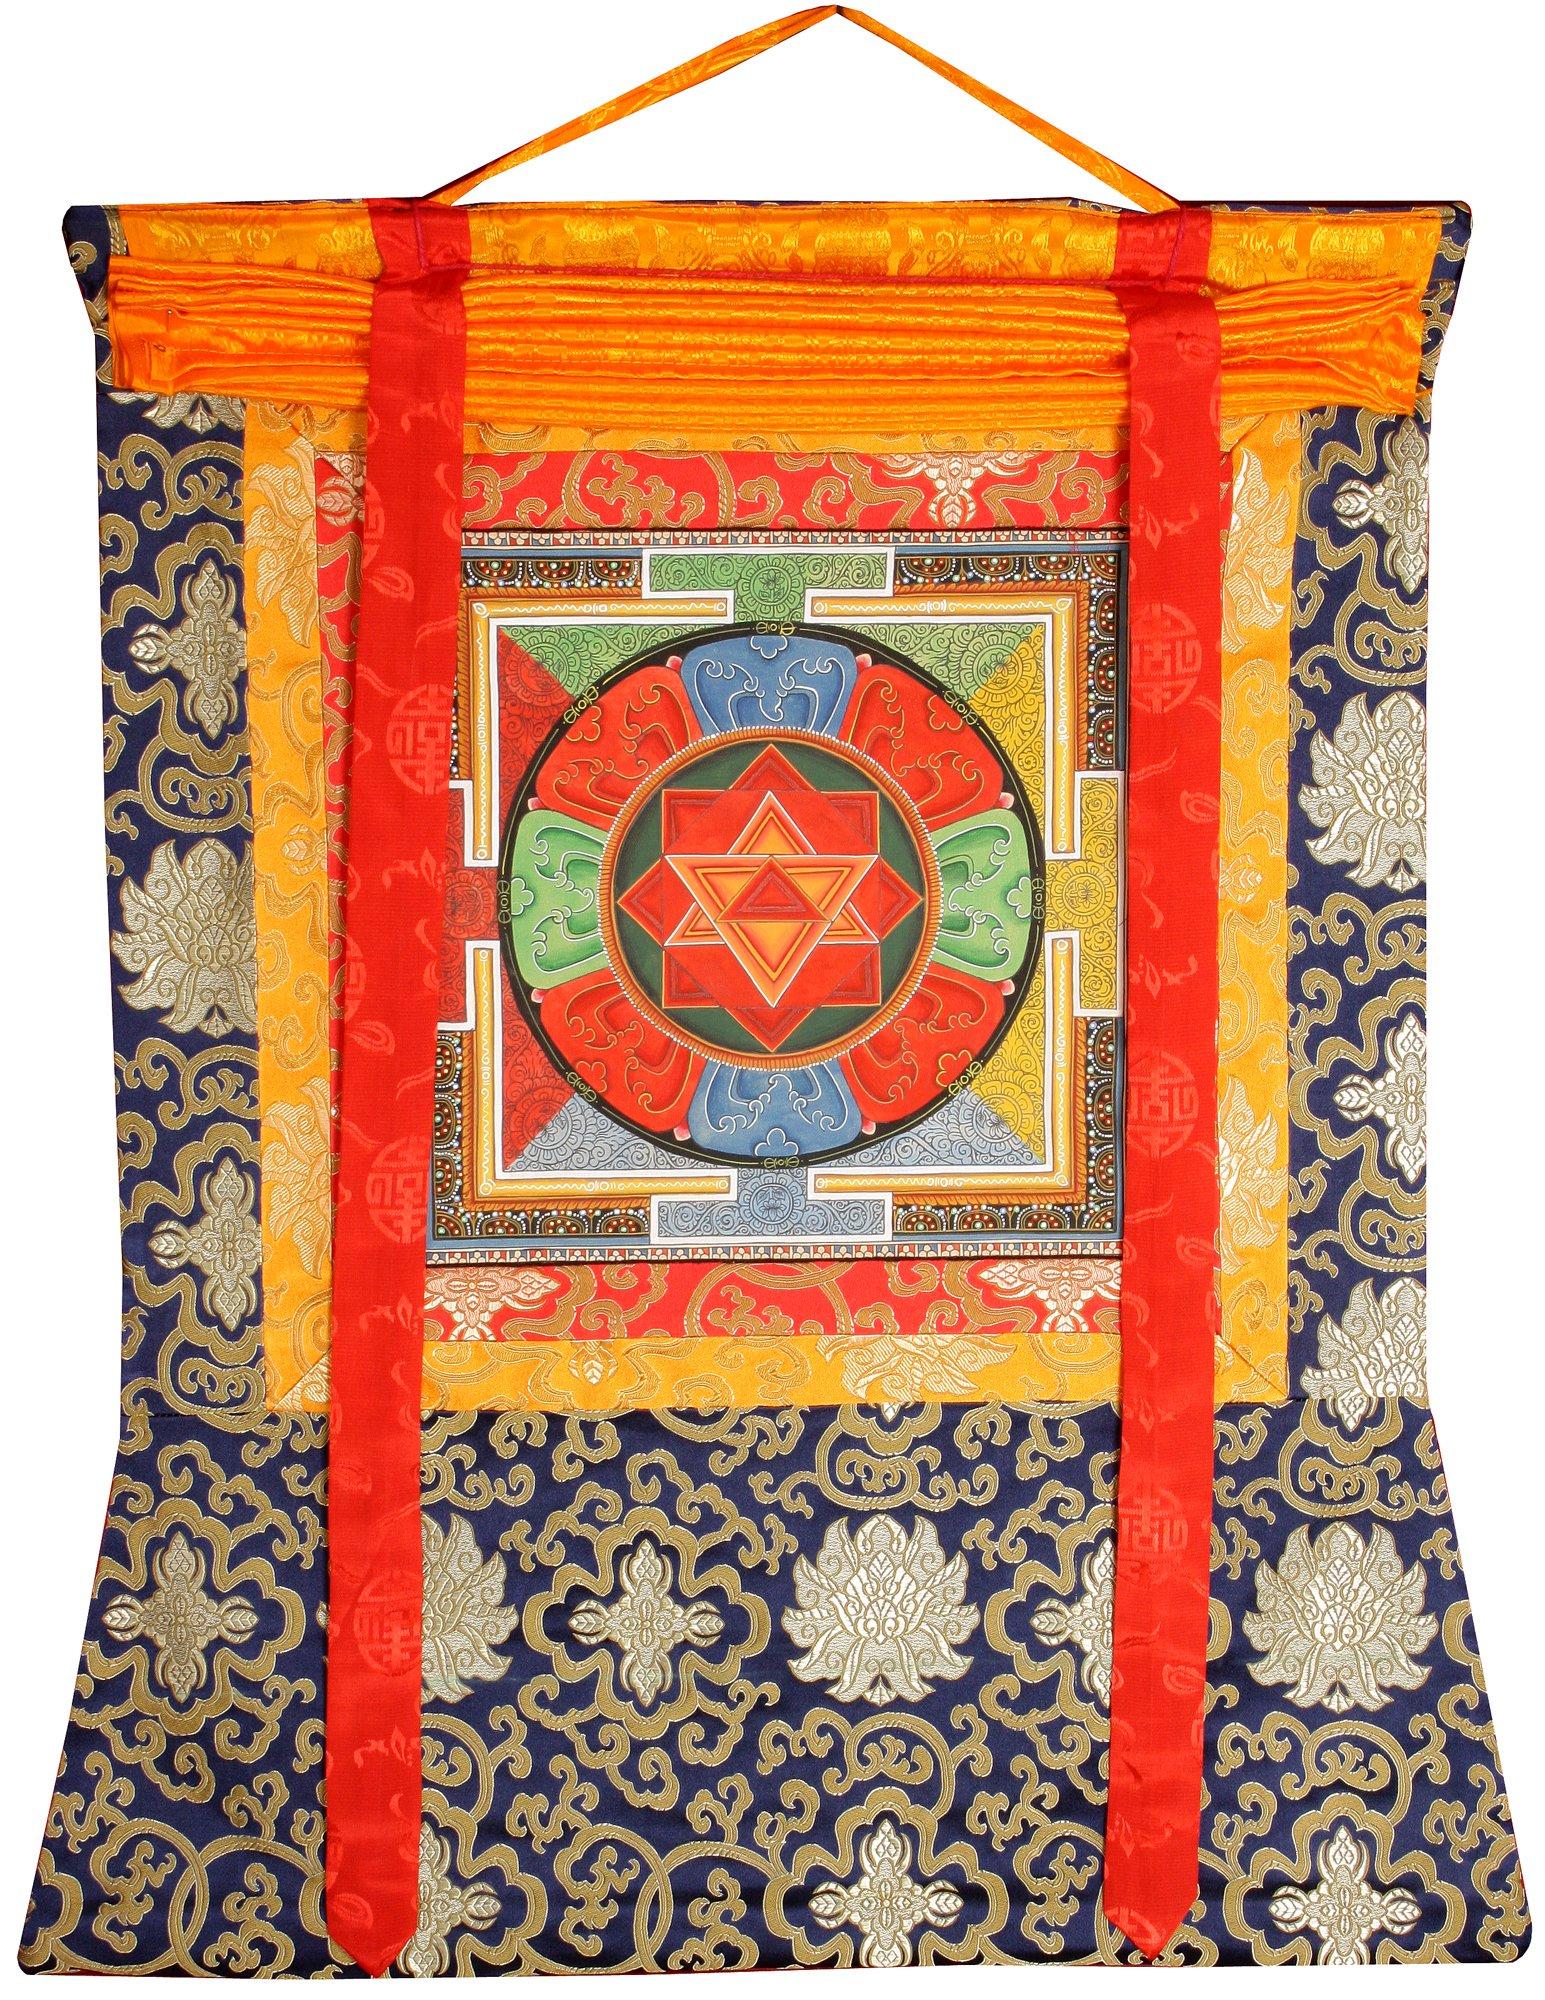 Vajrayogini Mandala - Tibetan Thangka Painting by Exotic India (Image #2)